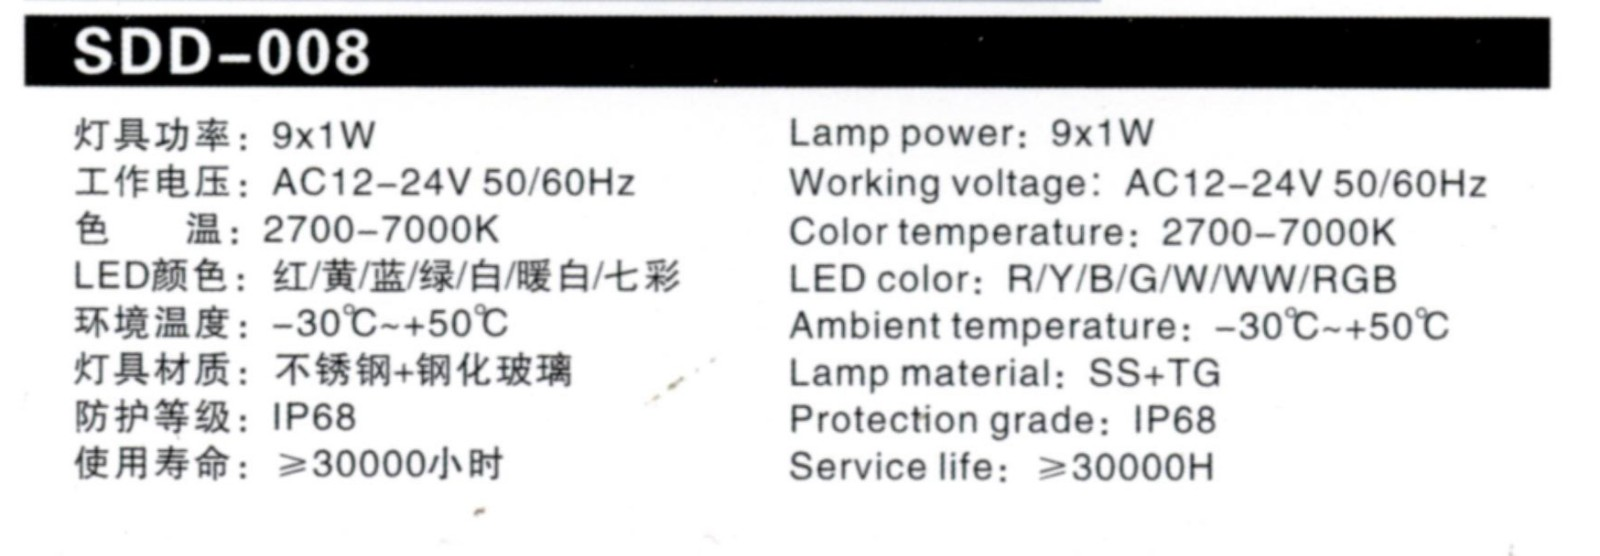 LED水底灯Model∶SDD-008参数.jpg